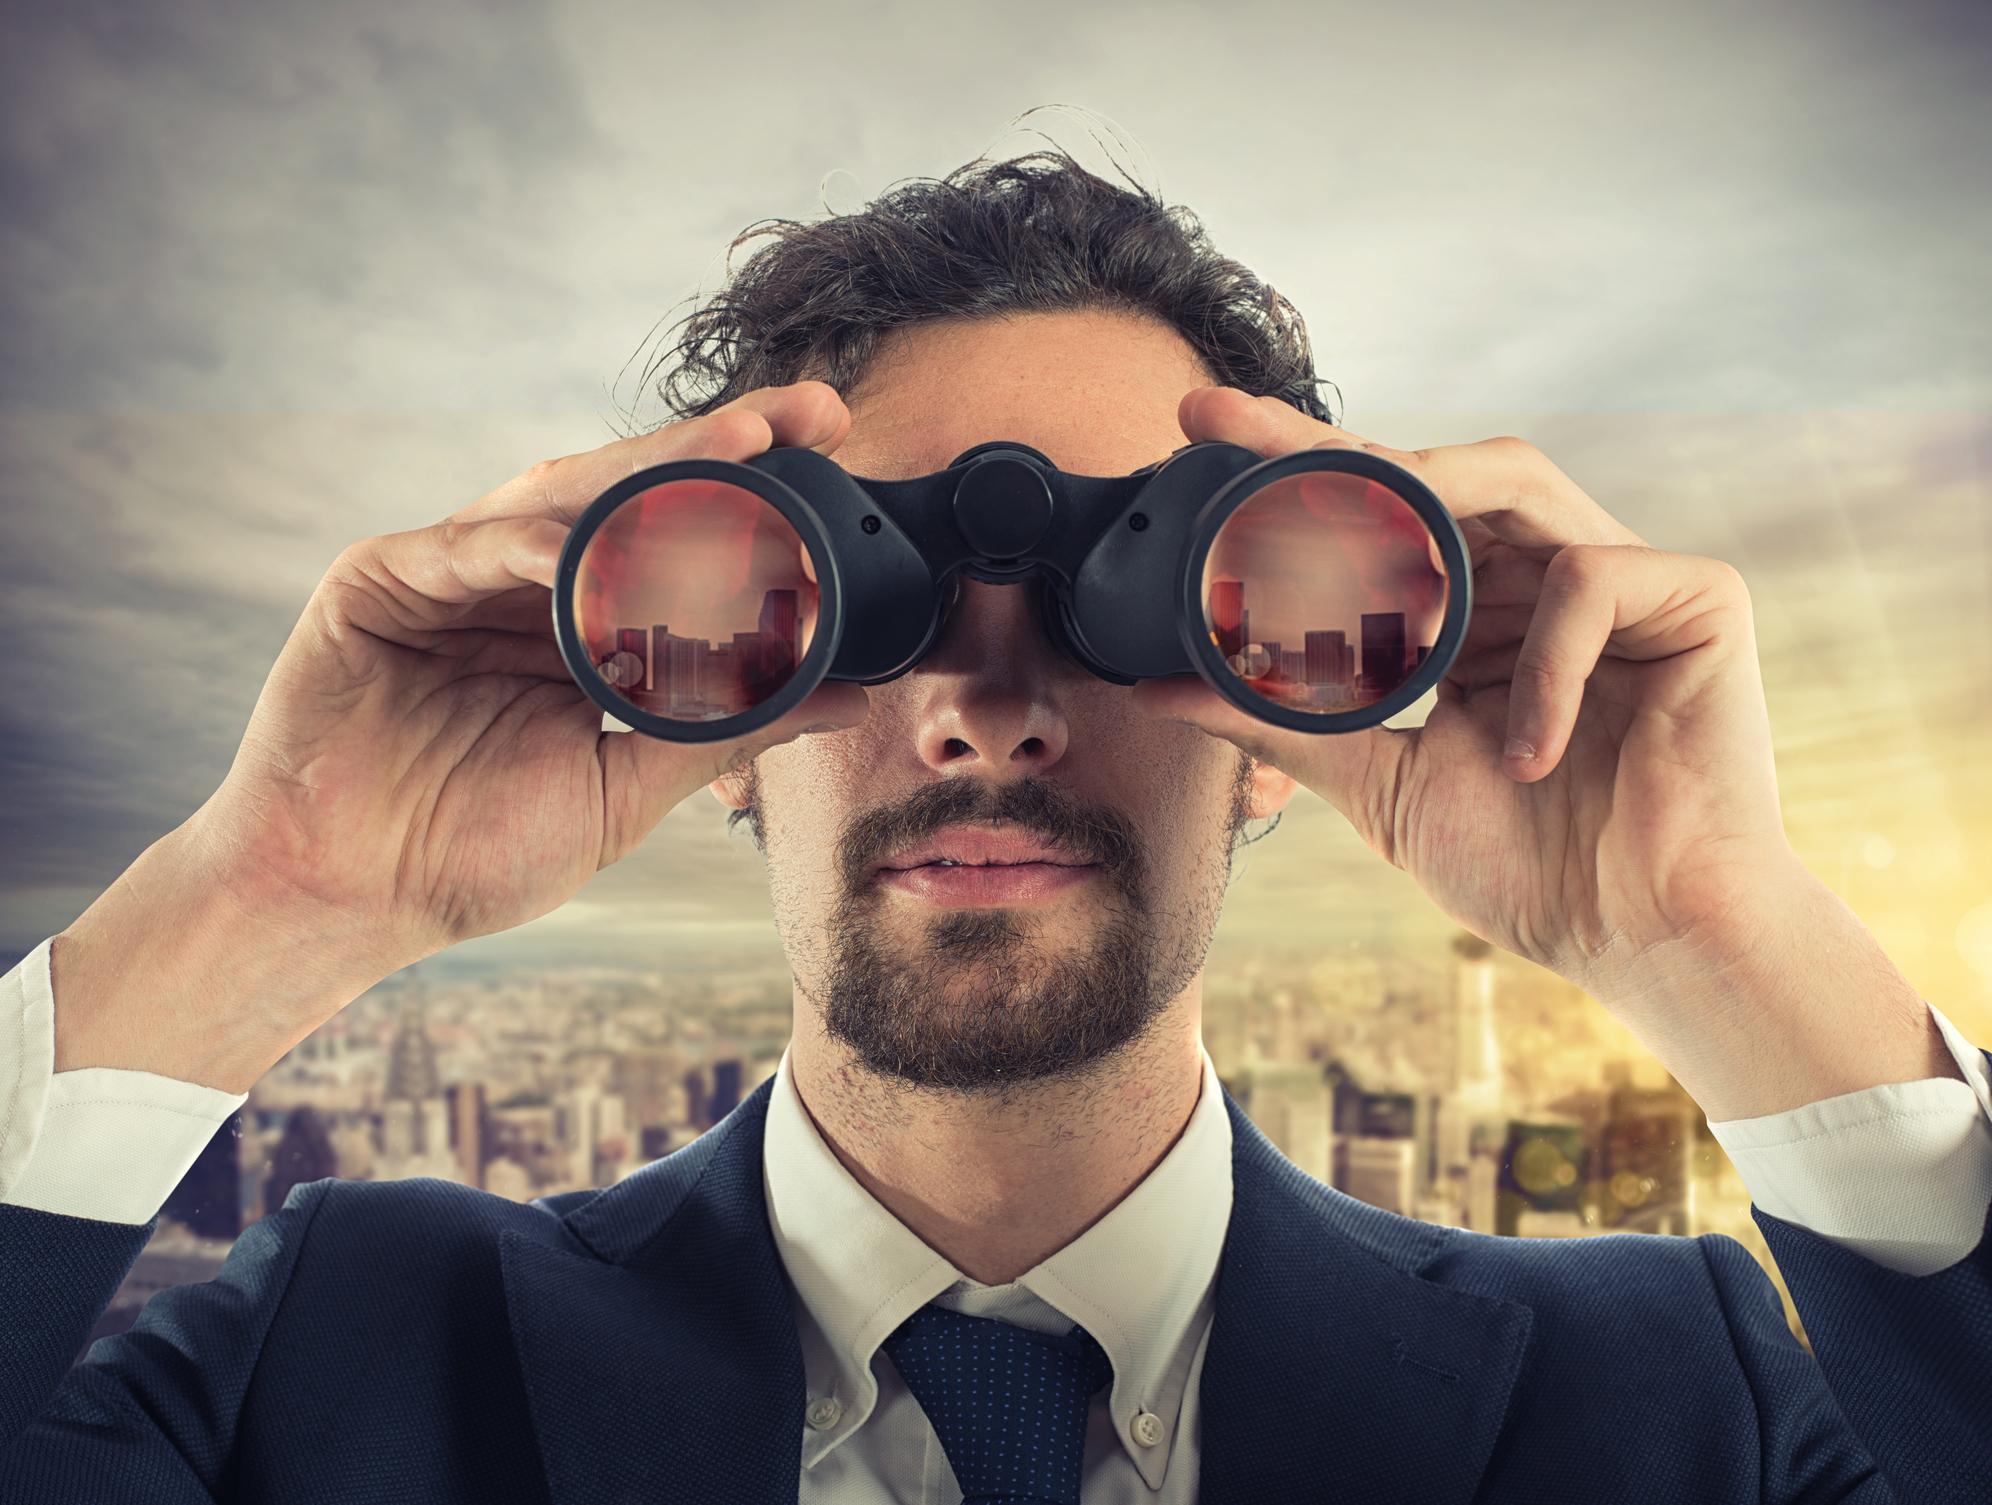 A man looks through binoculars.